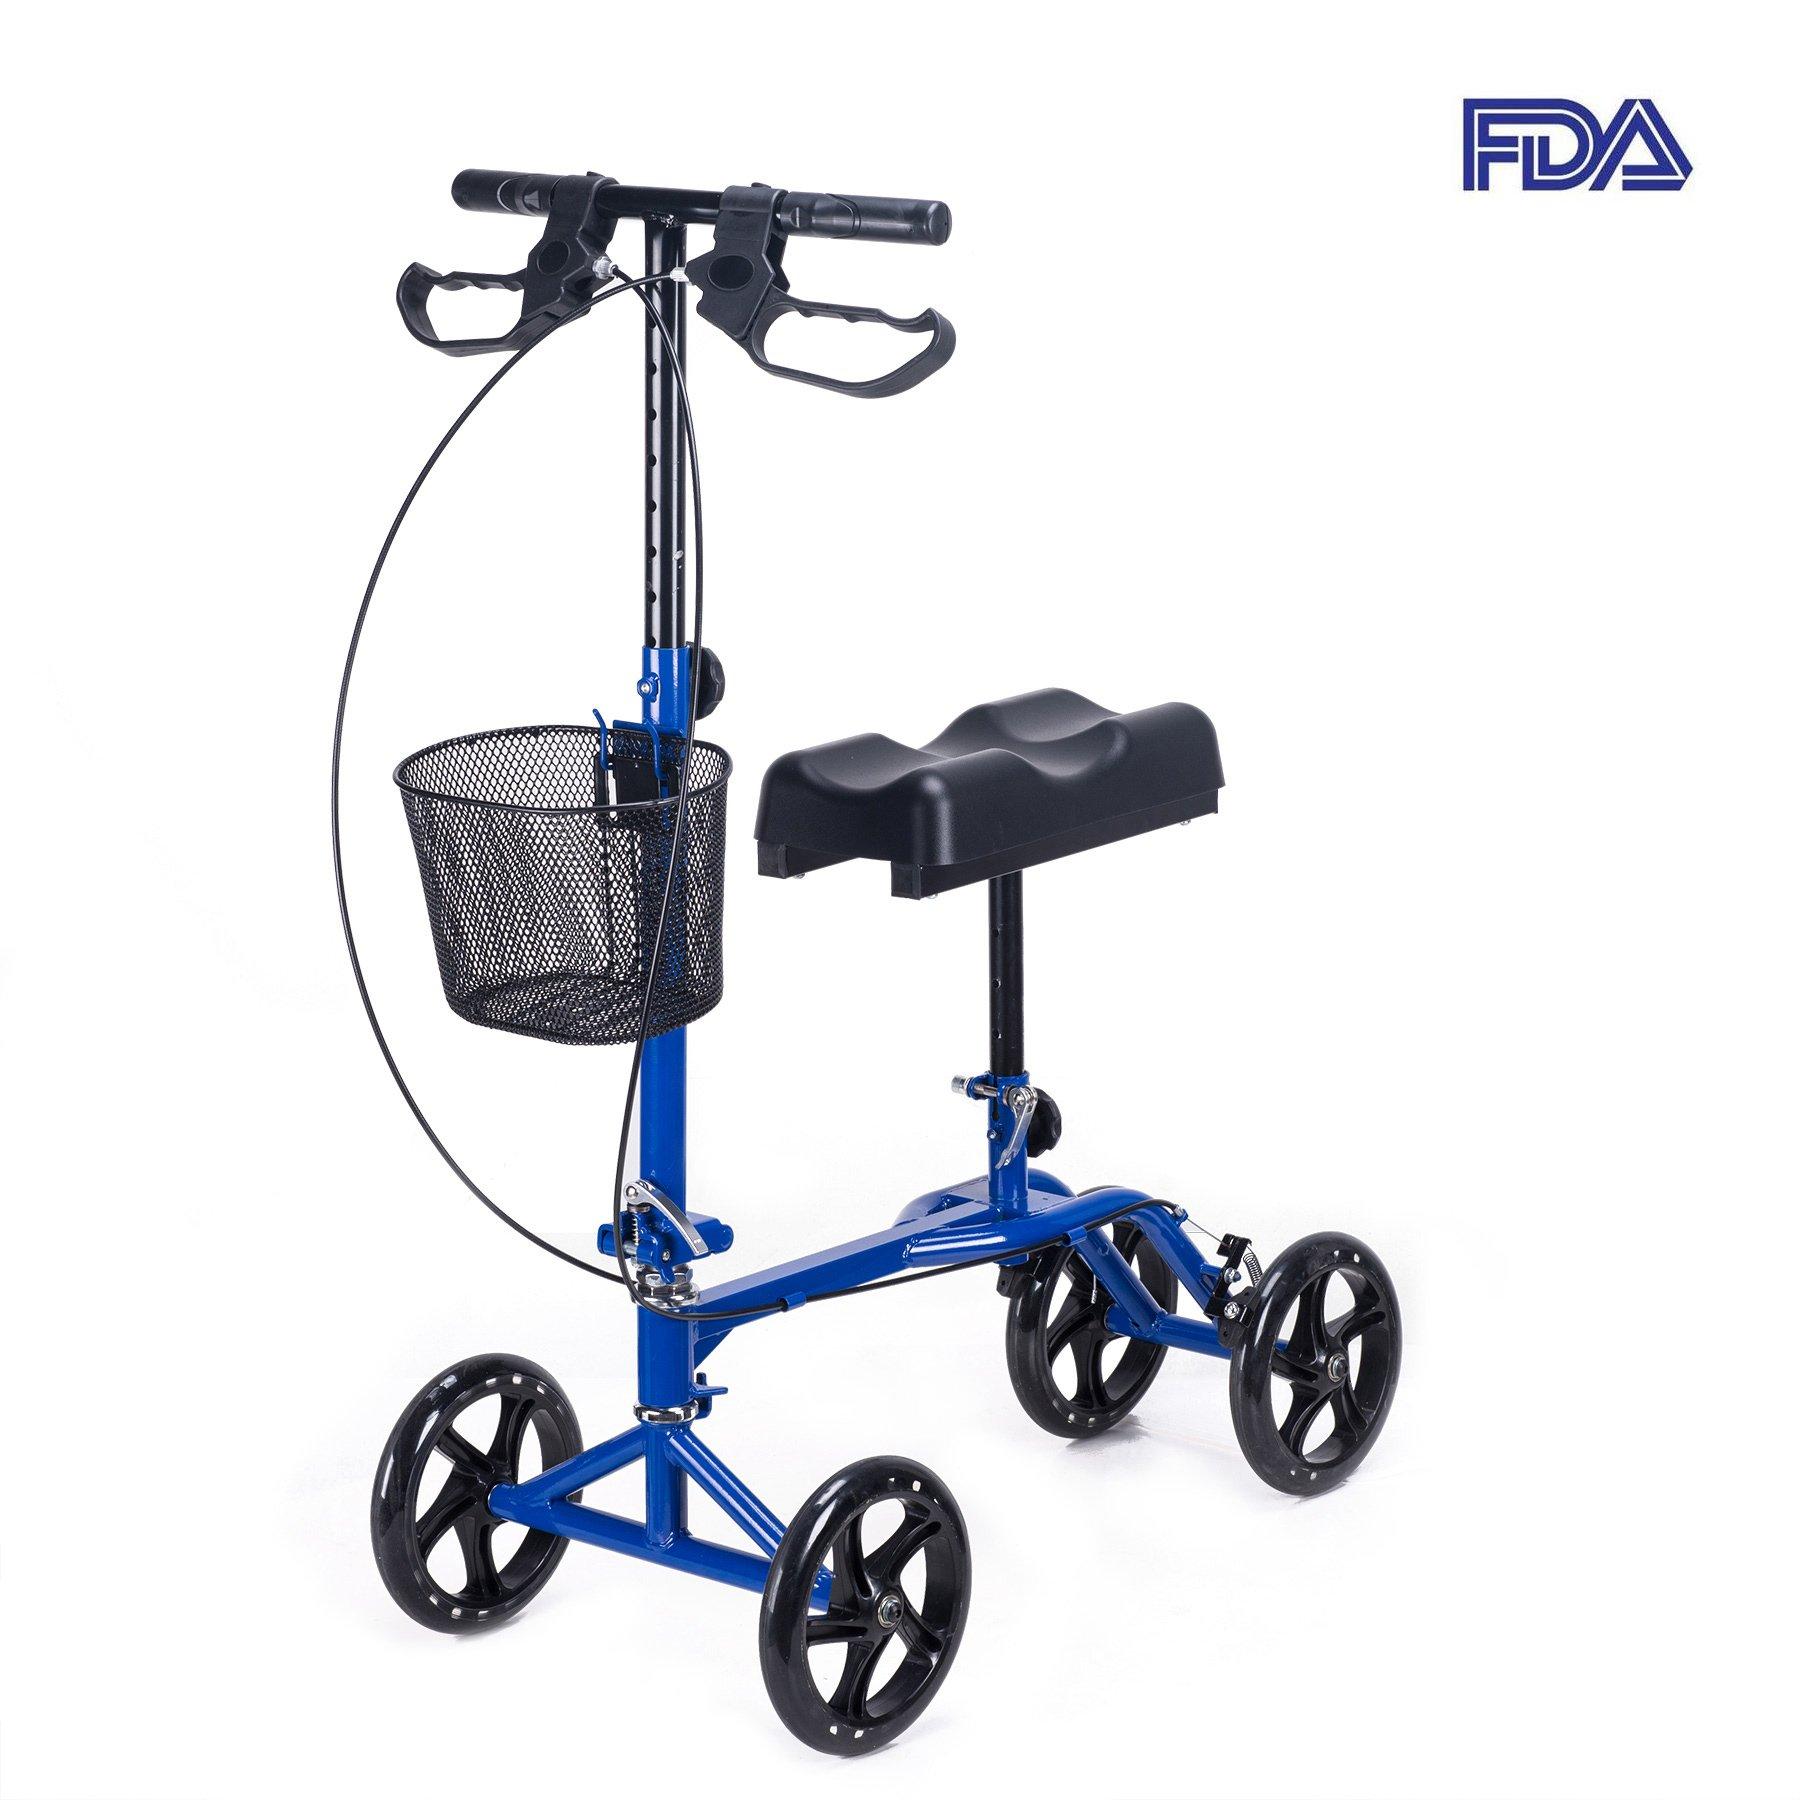 CO-Z Steerable Foldable Knee Walker Roller Scooter with Basket, 8'' Antiskid Rubber Wheels, Safety Double Brakes, Leg Walker Crutch (Blue)